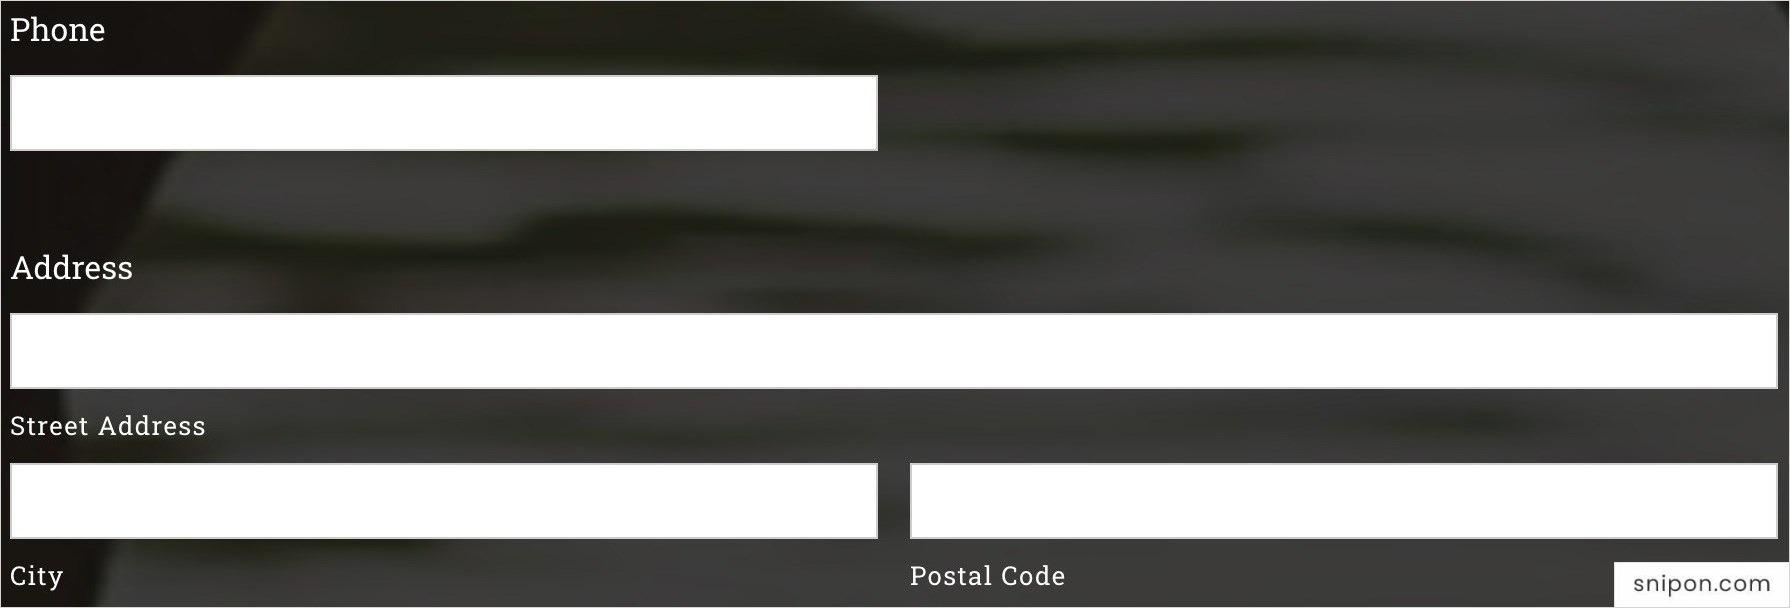 Enter Phone & Email Address - Turtle Jack's Survey